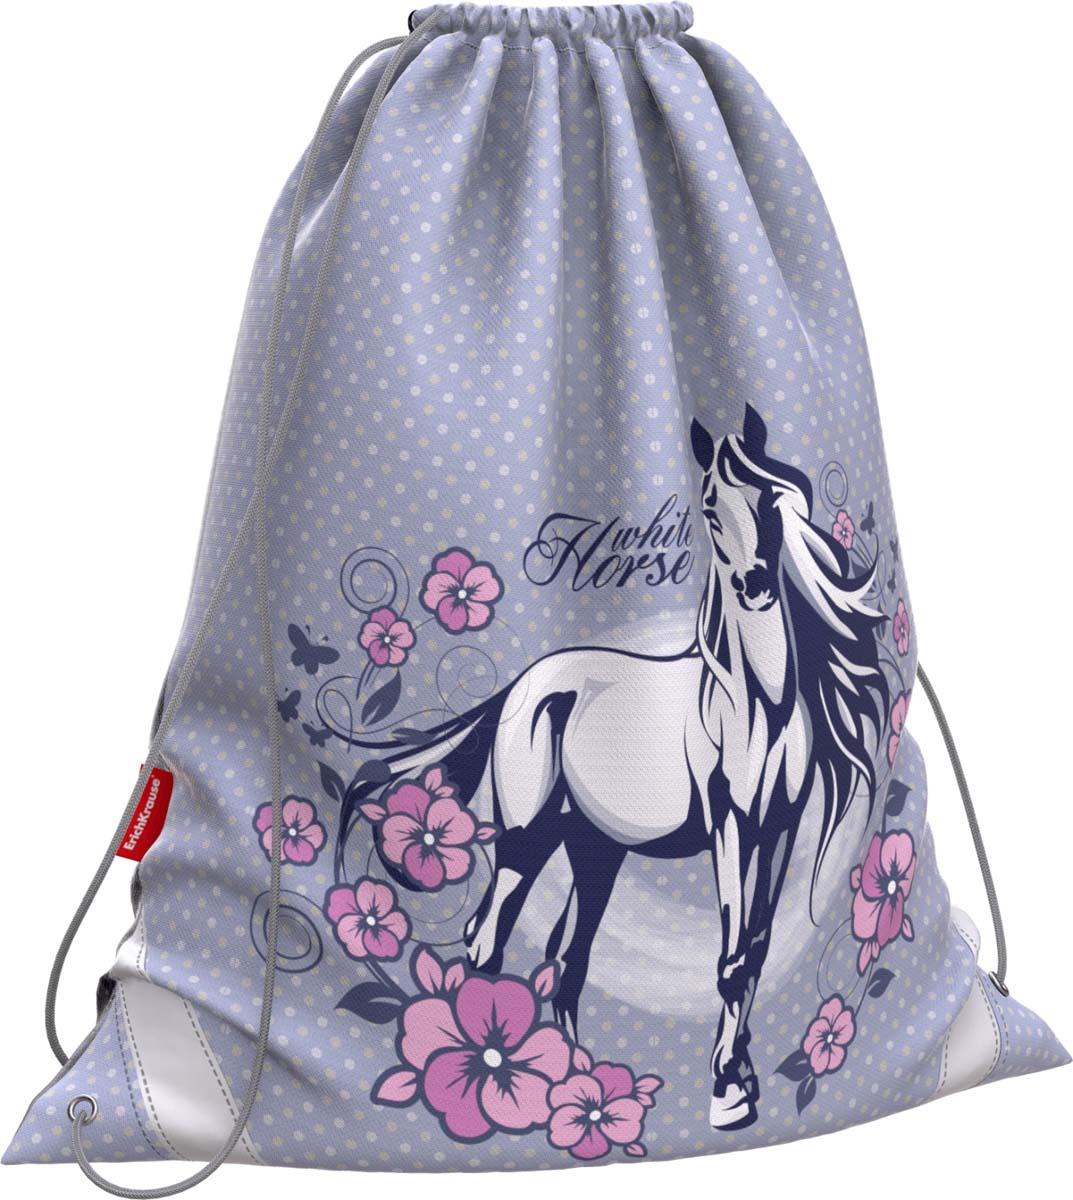 Erich Krause Сумка для сменной обуви White Horse 44664 цена